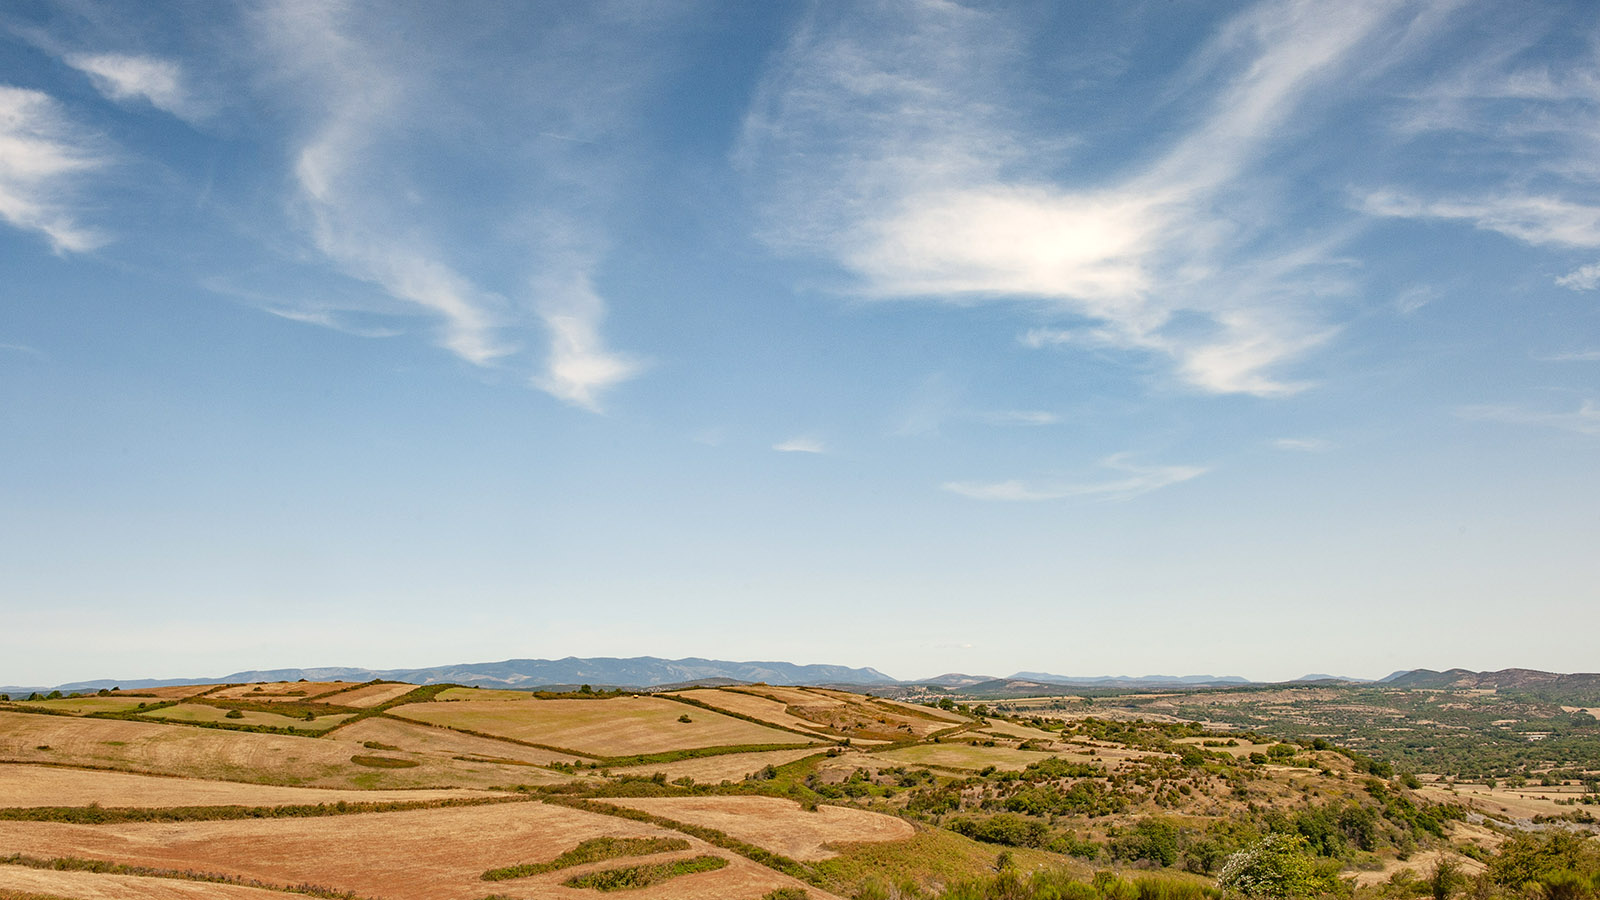 Der Causse de Larzac bei Le Caylar. Foto: Hilke Maunder